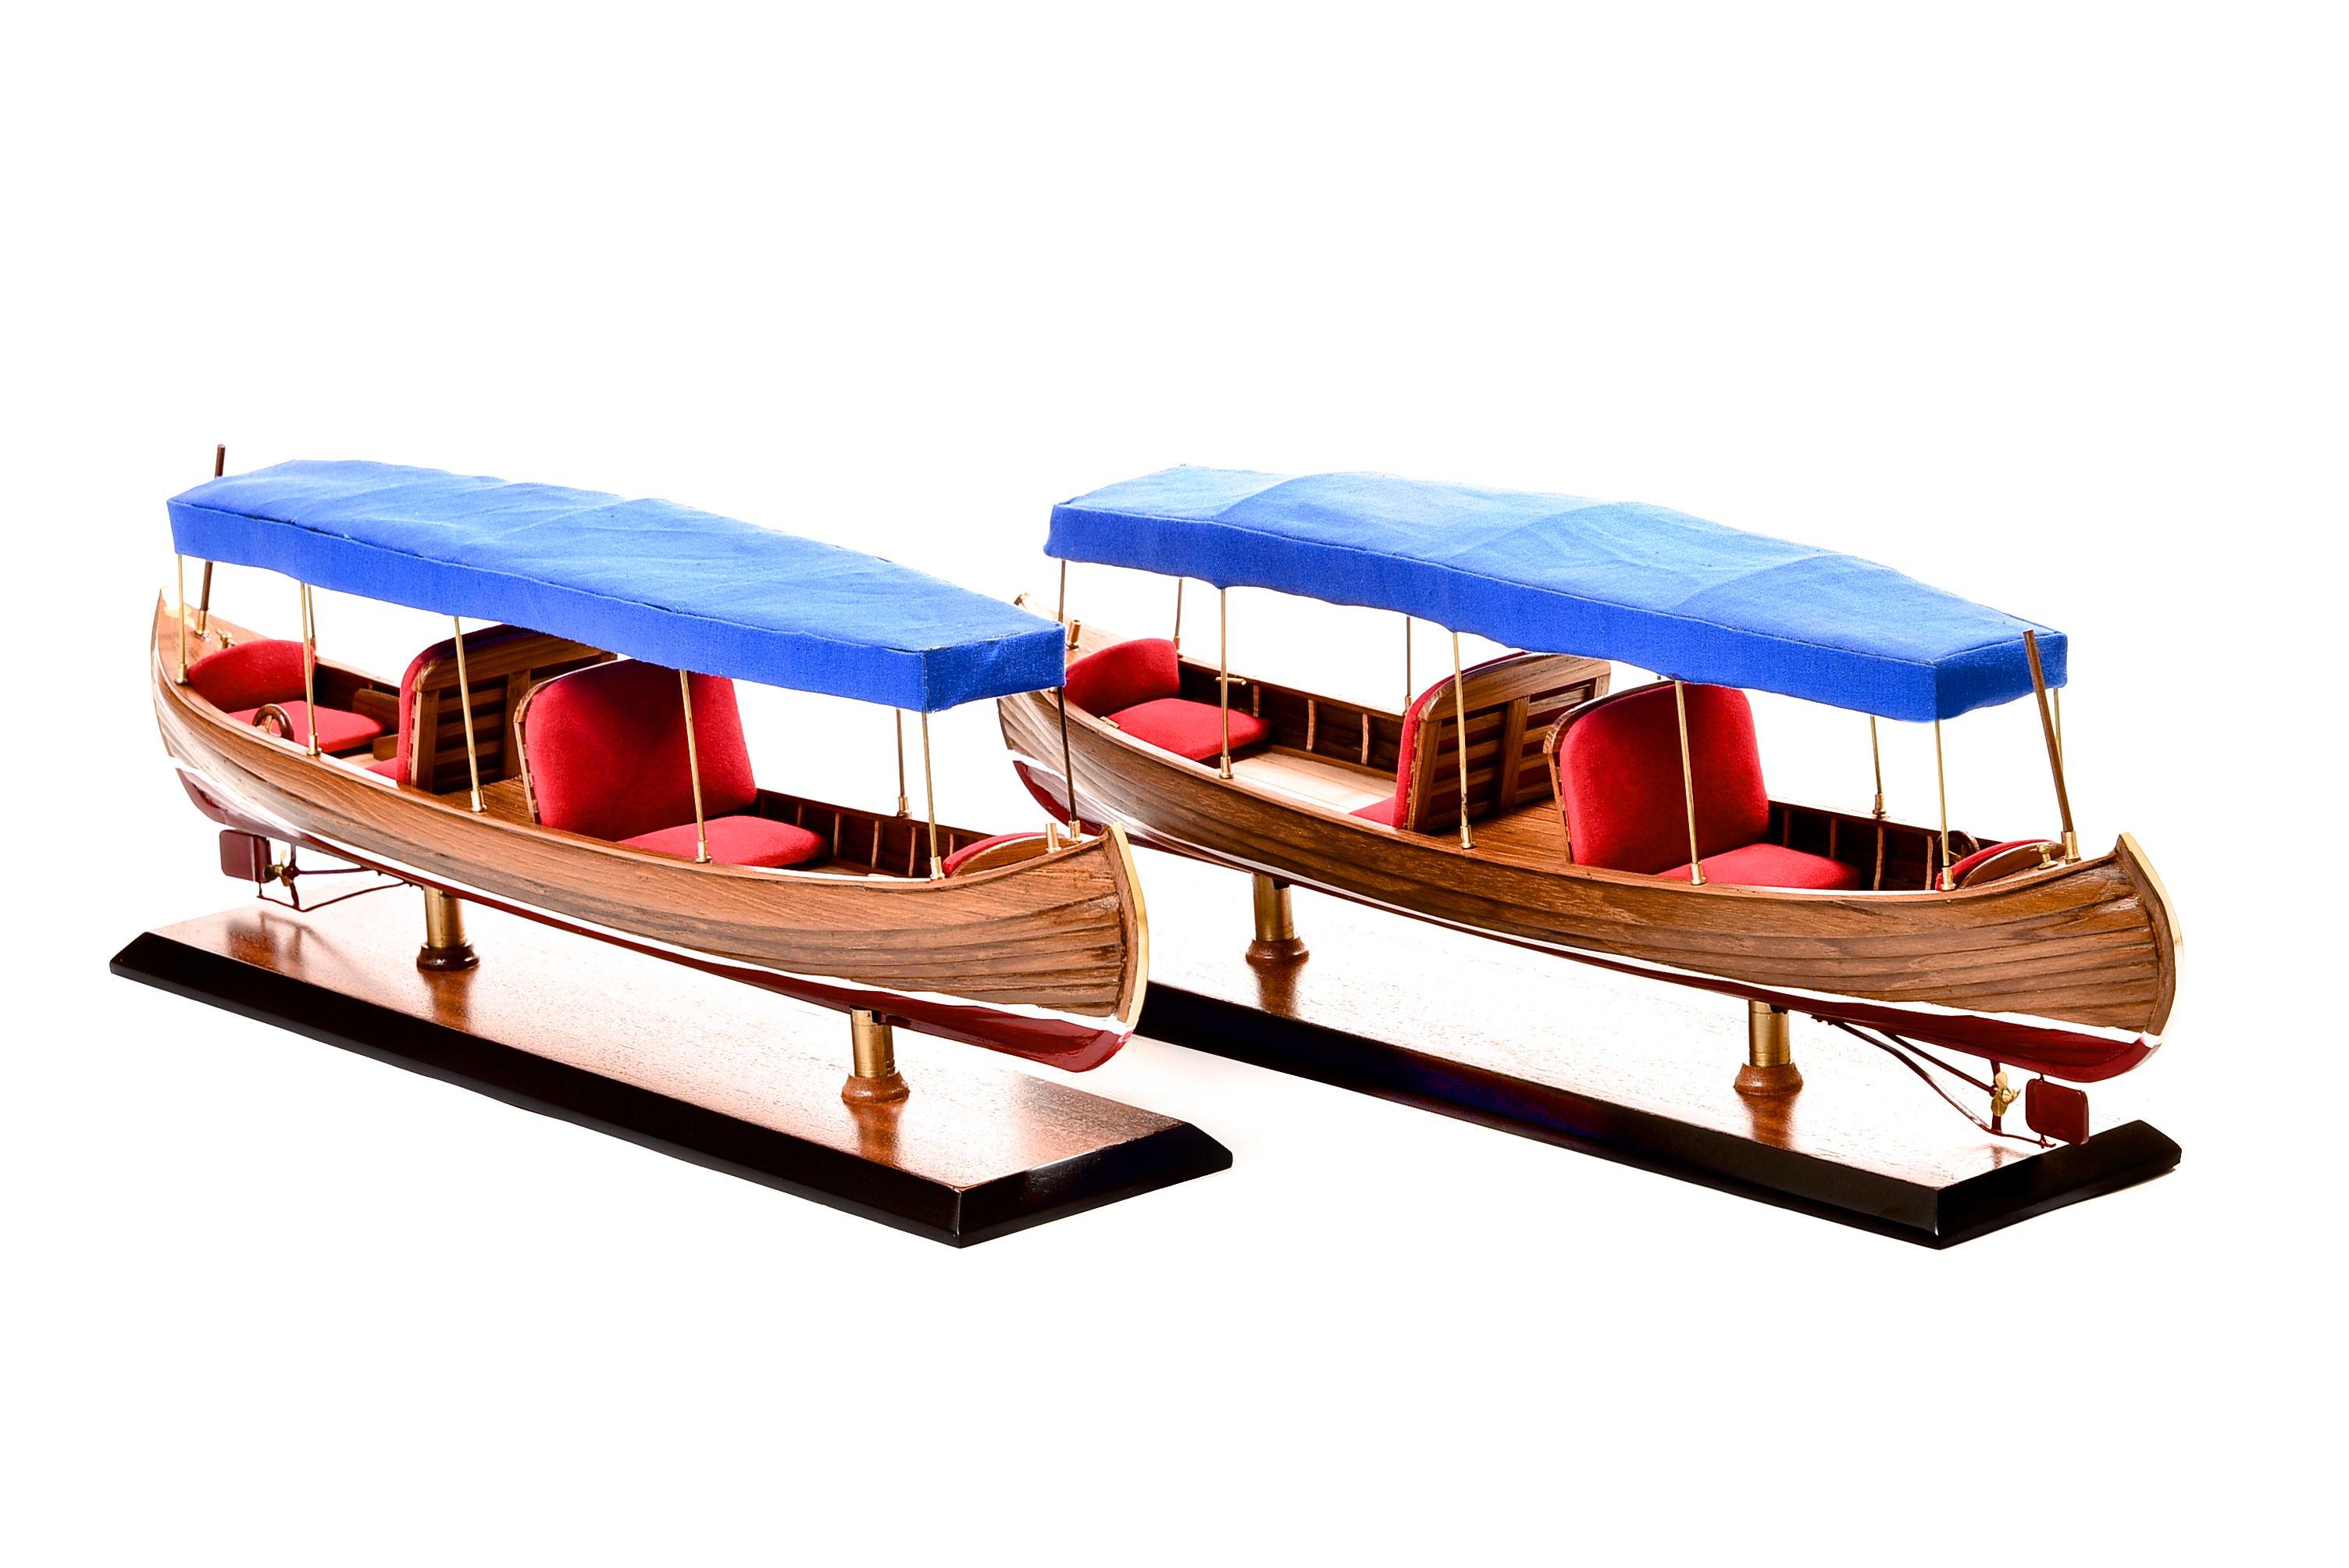 1865-11250-Liddesdale-Electric-Canoe-1920